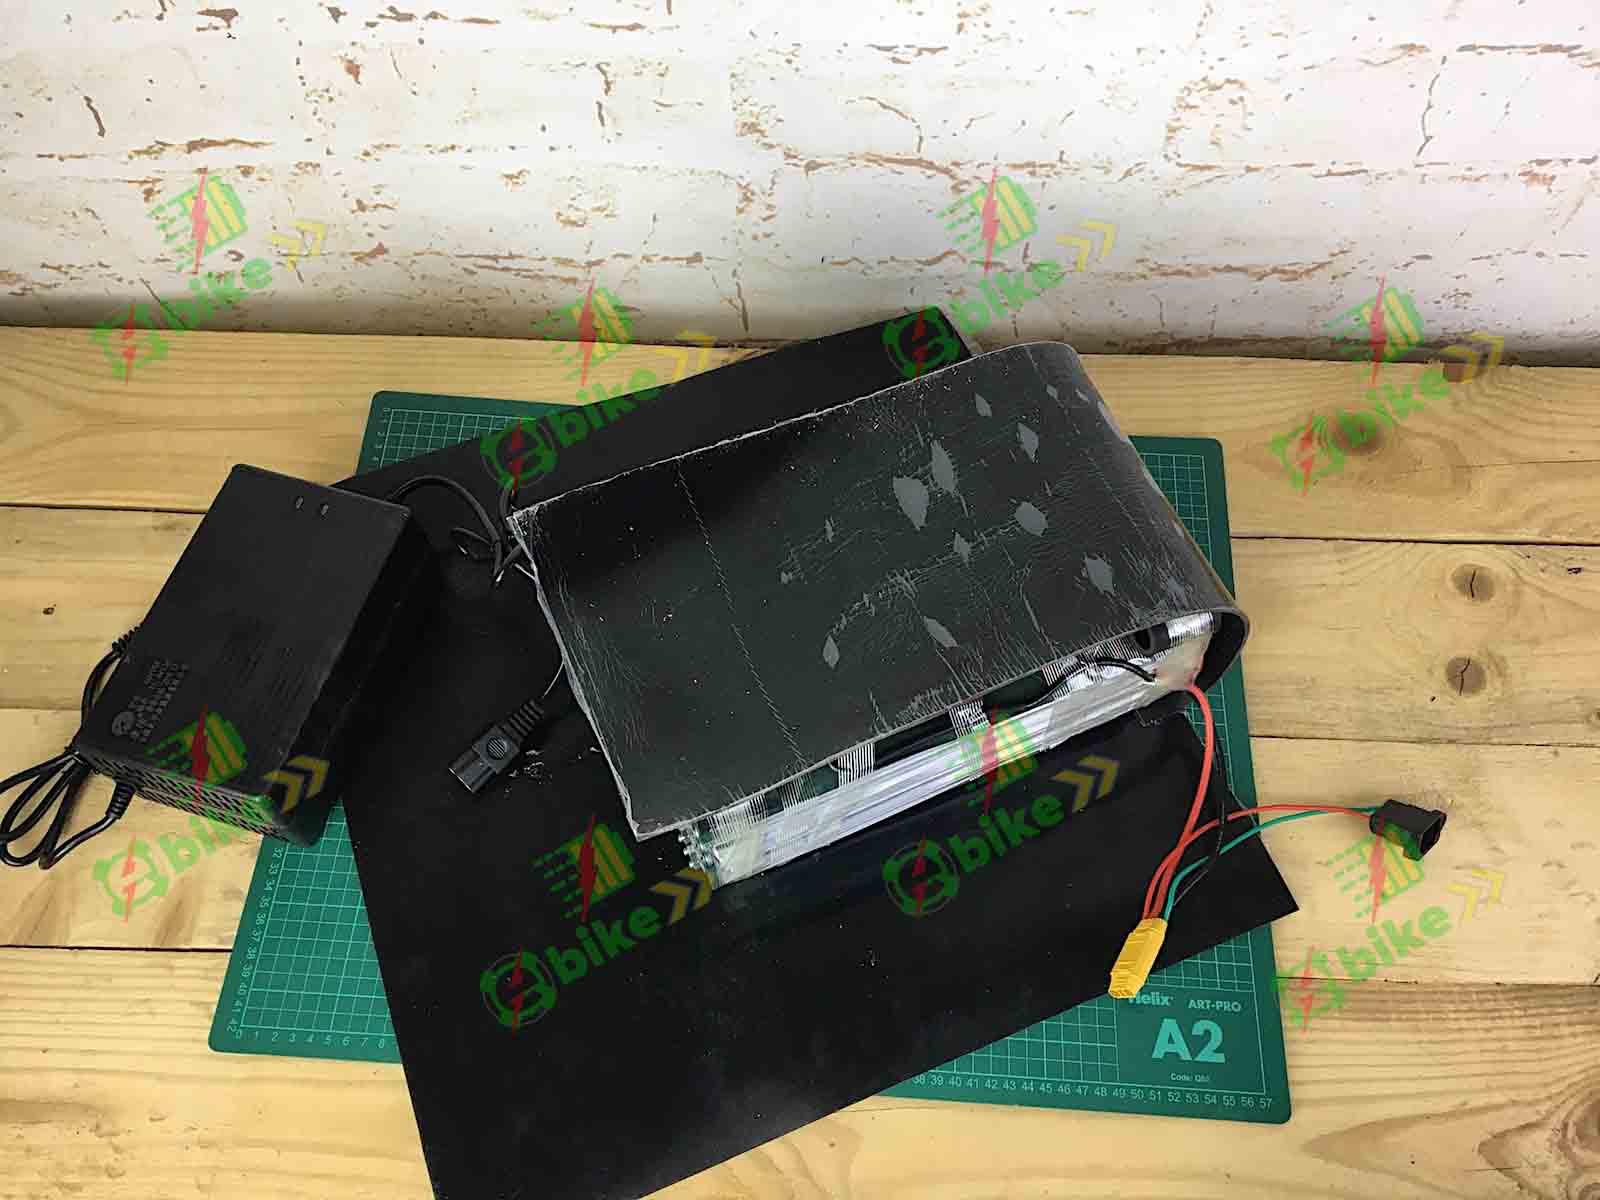 Сборка Аккумулятора из пакетов LiHV 4,35v 17s для электрического трицикла